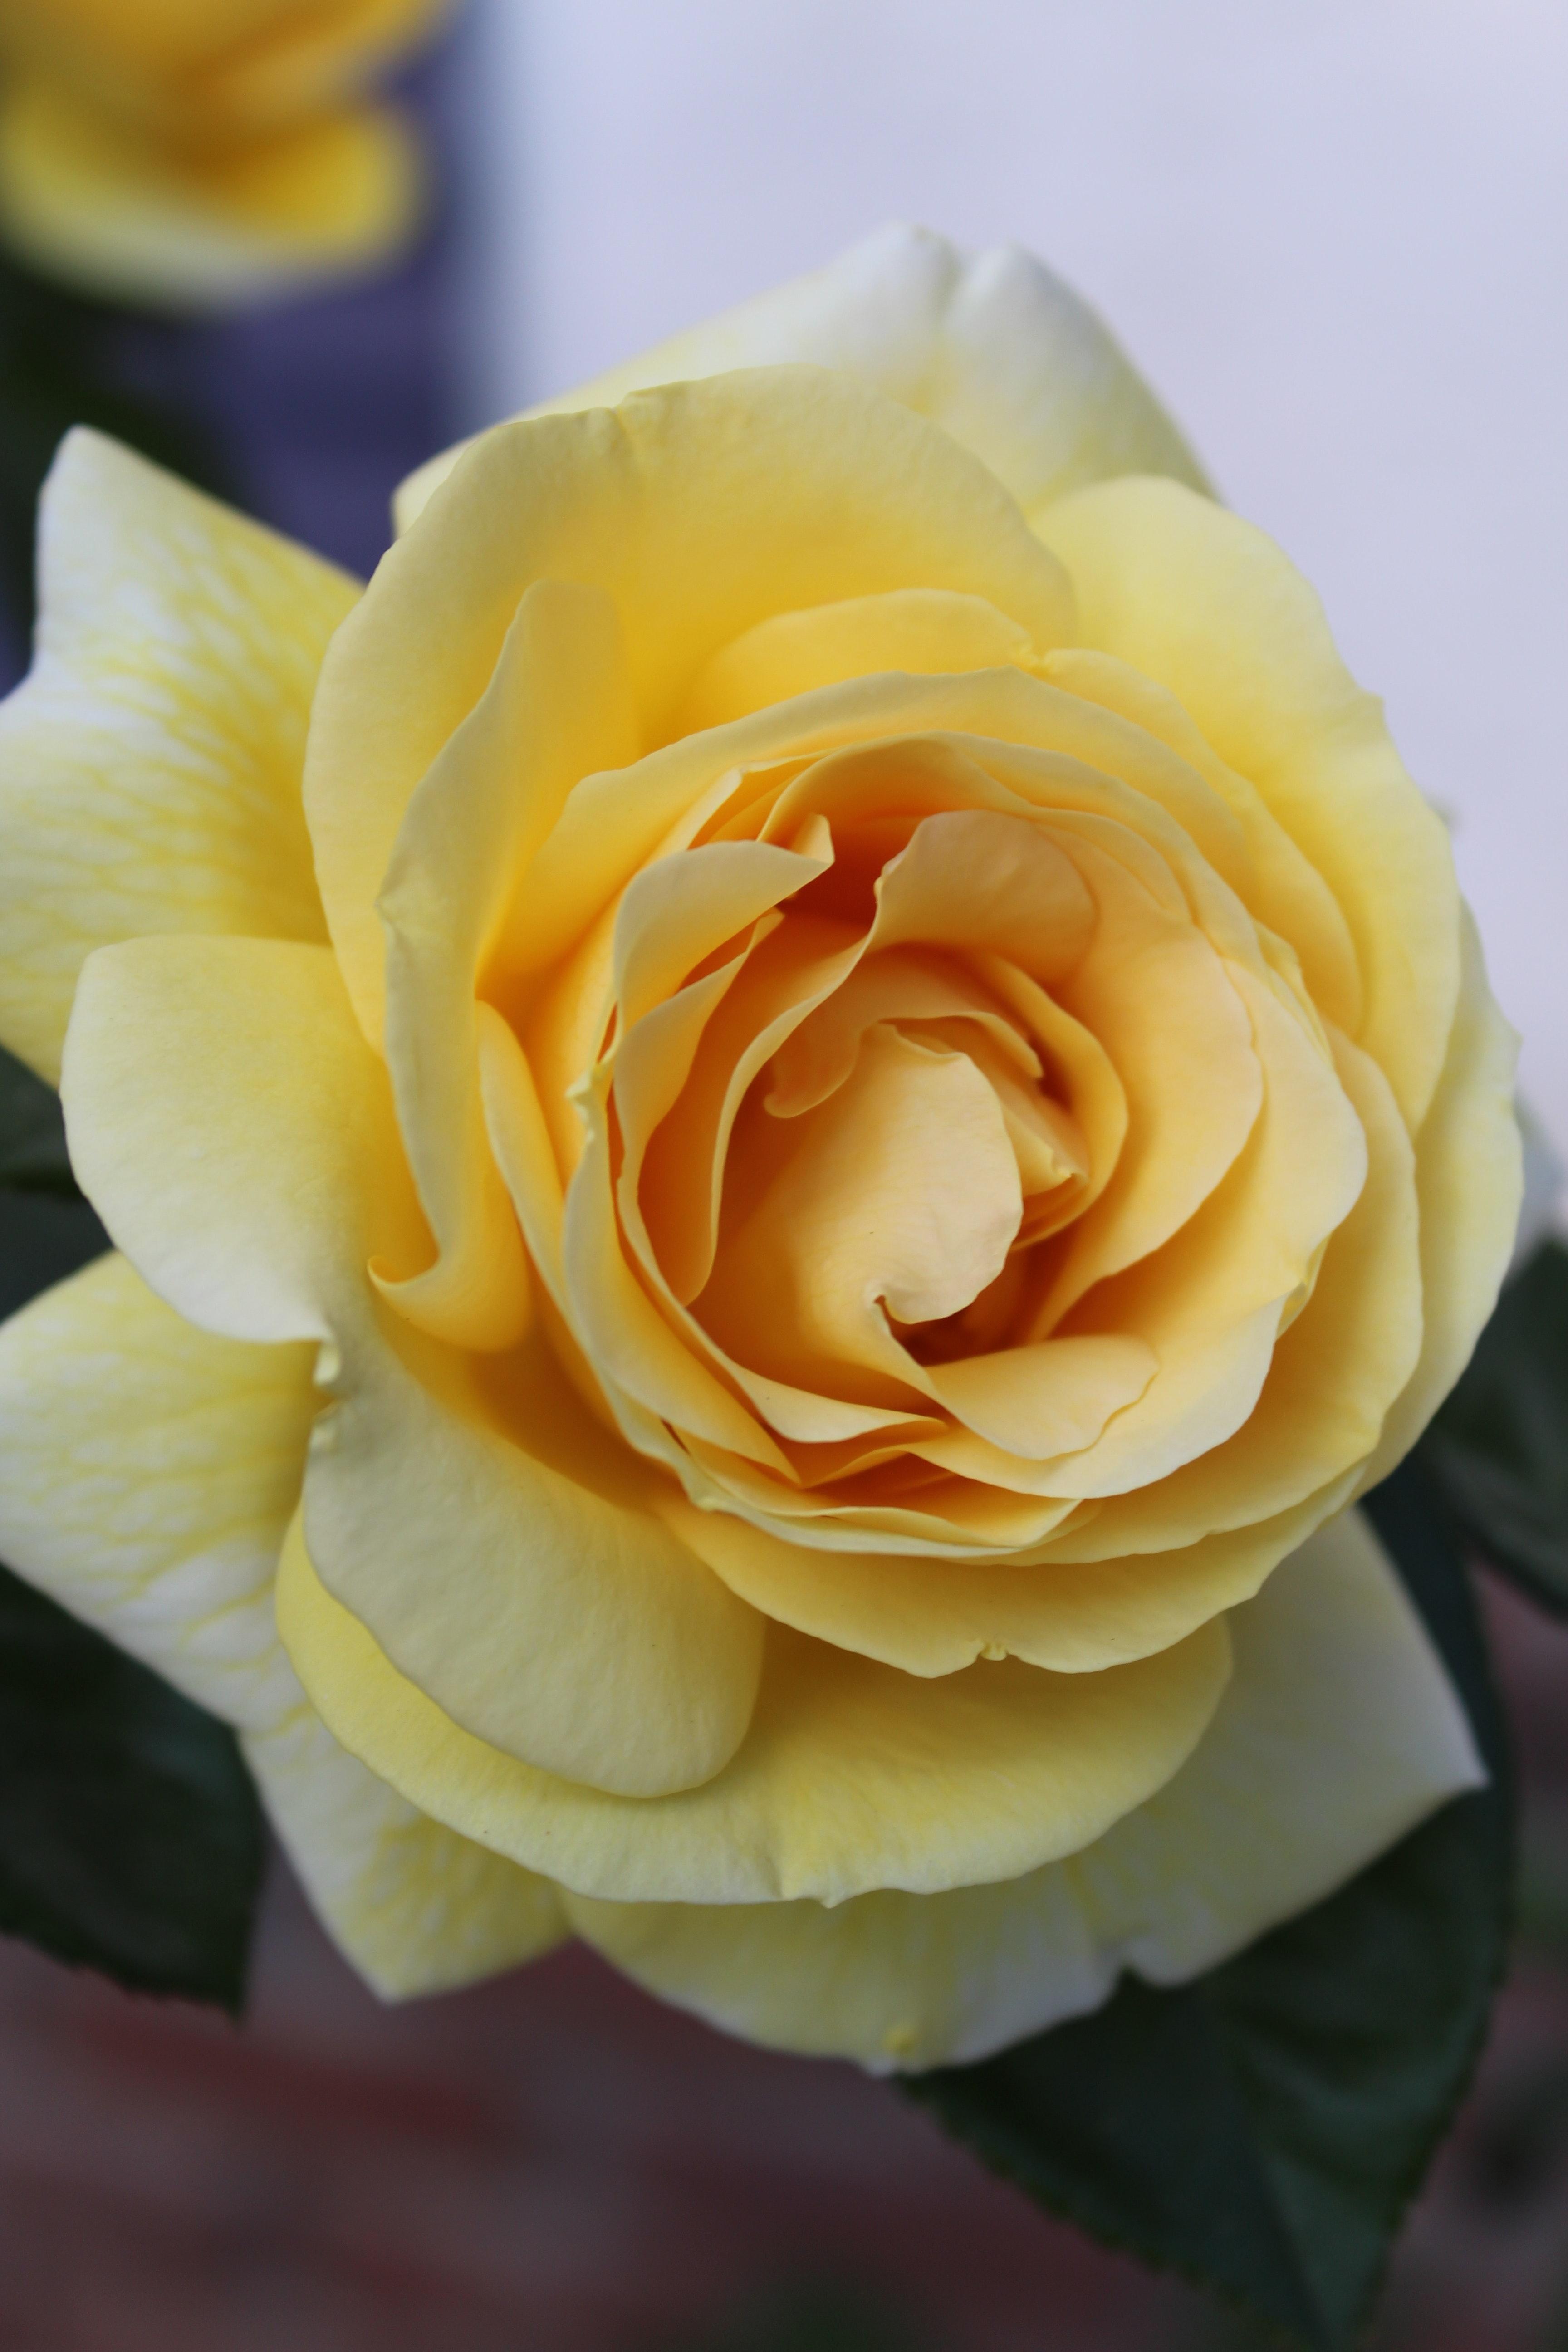 1000 Engaging Yellow Rose Photos Pexels Free Stock Photos